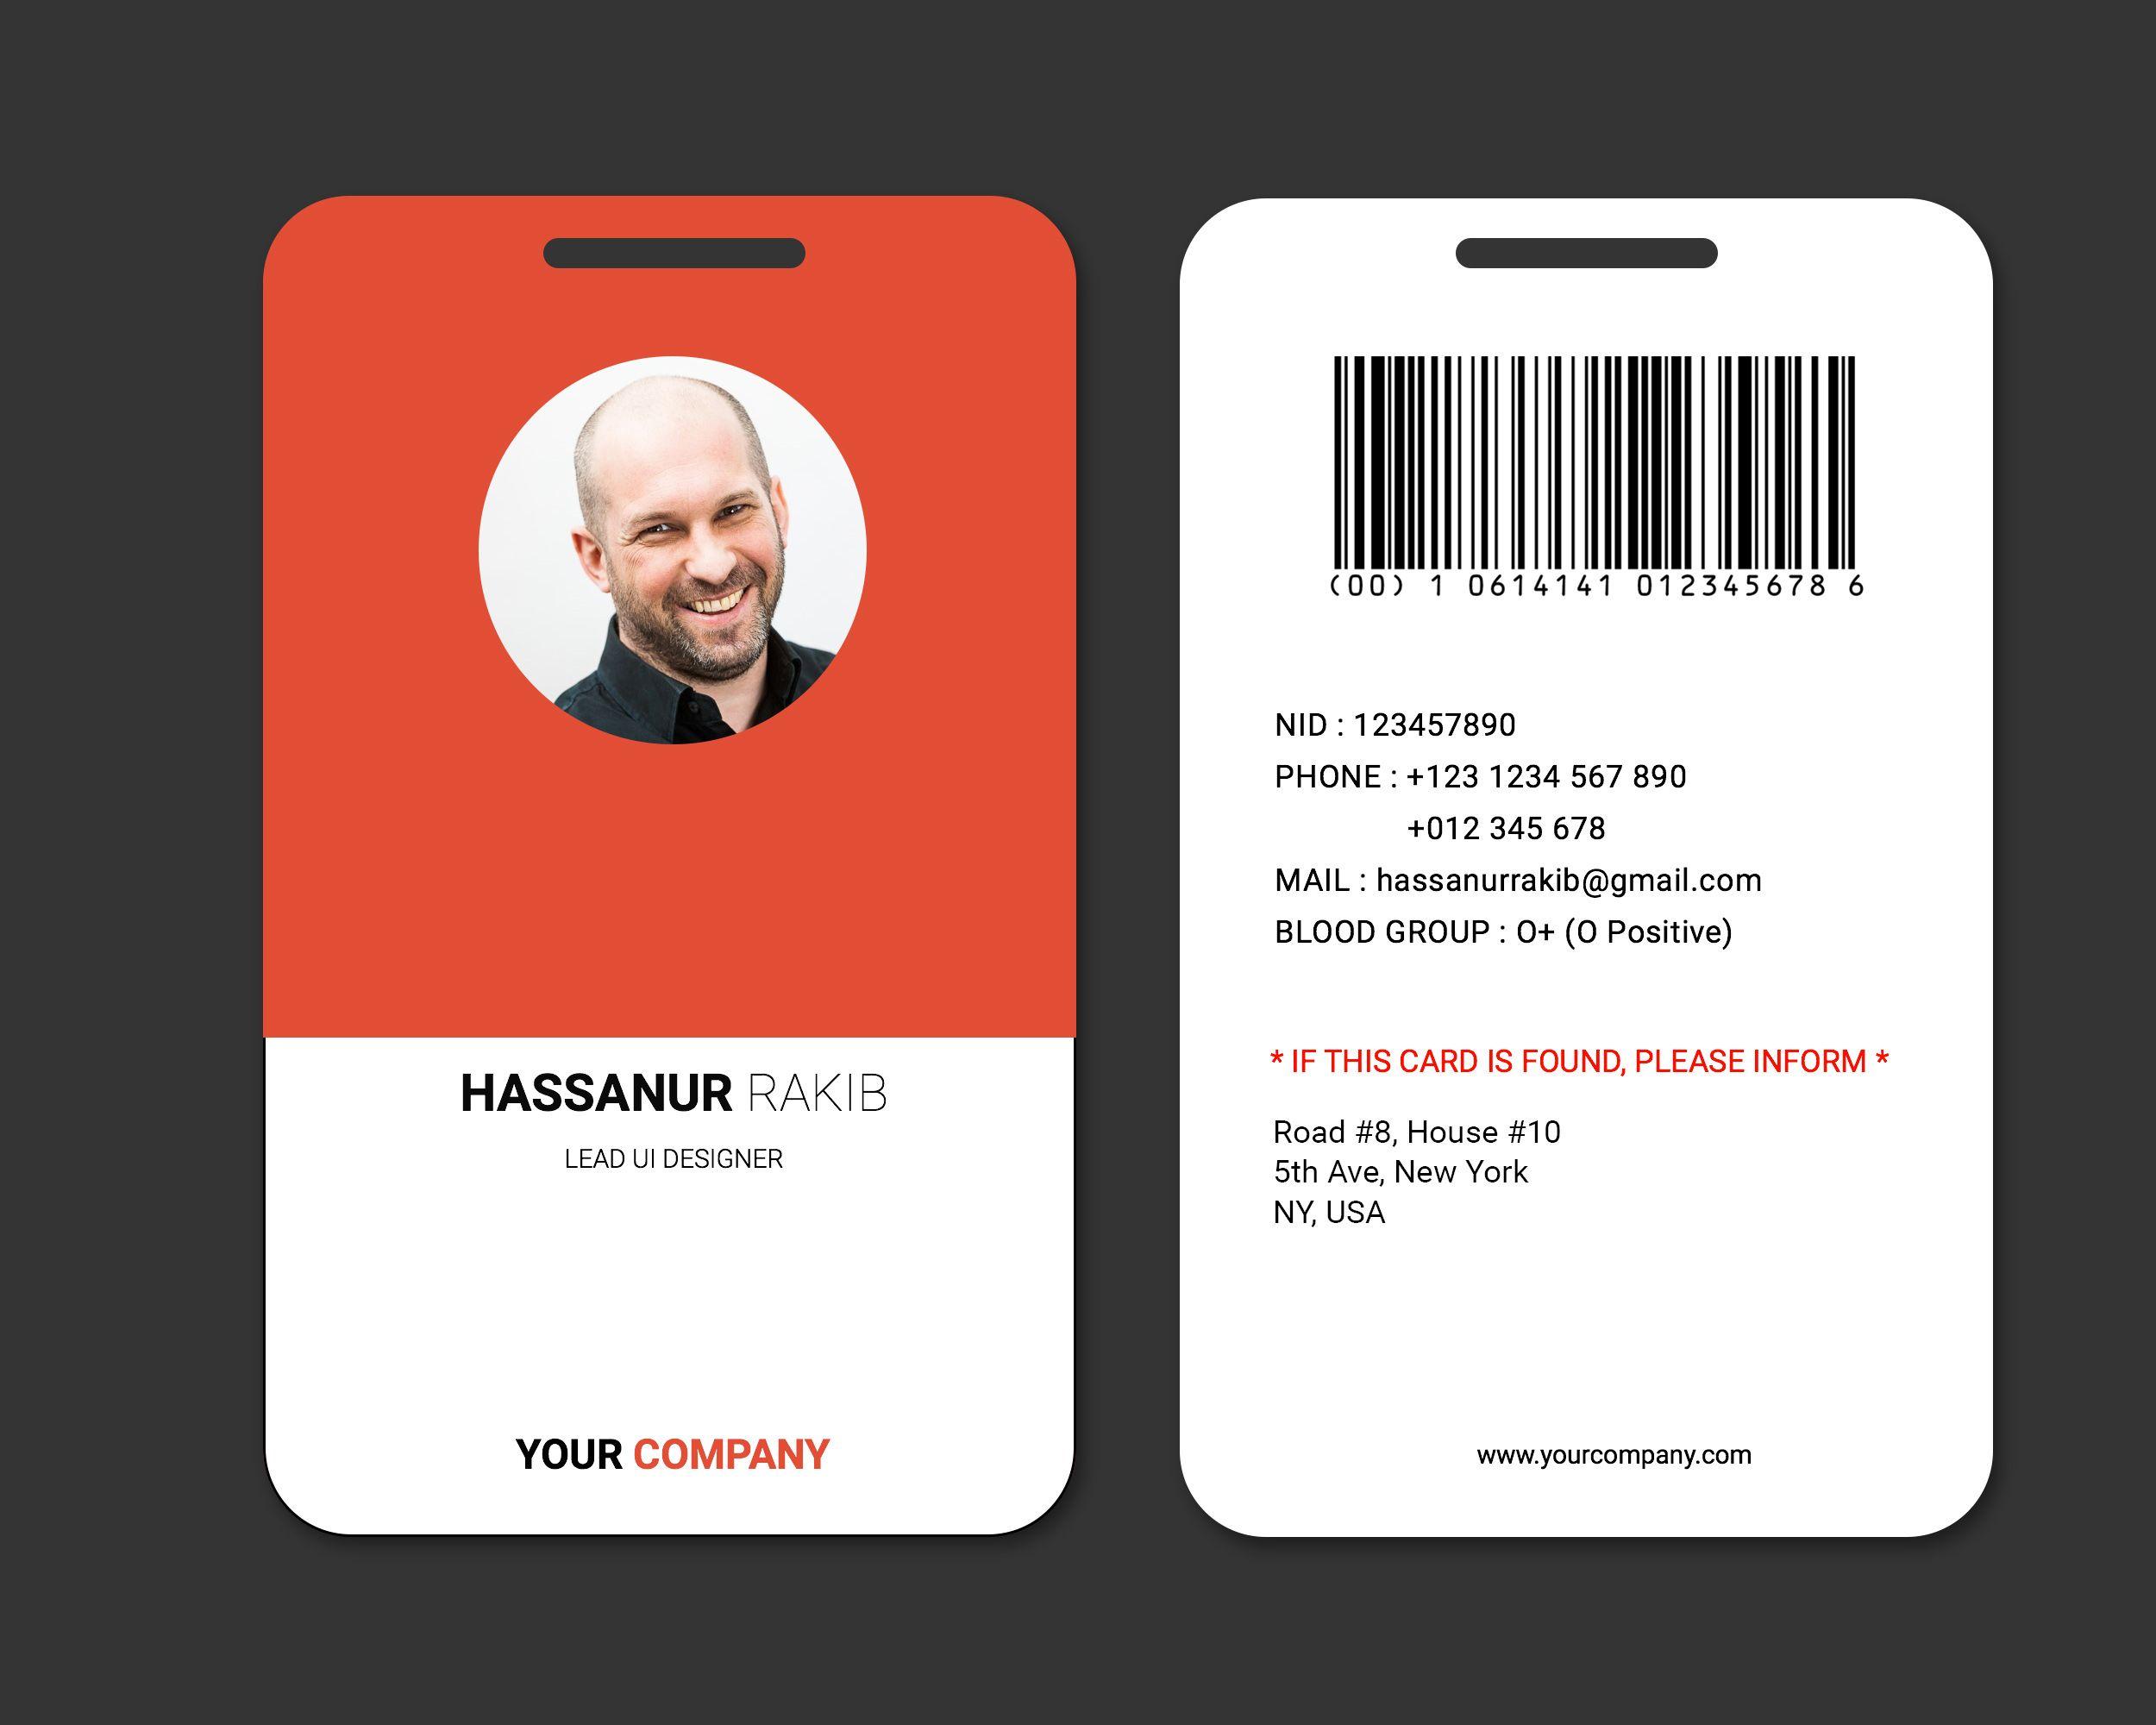 corporate office badge for employee id presentaci n. Black Bedroom Furniture Sets. Home Design Ideas